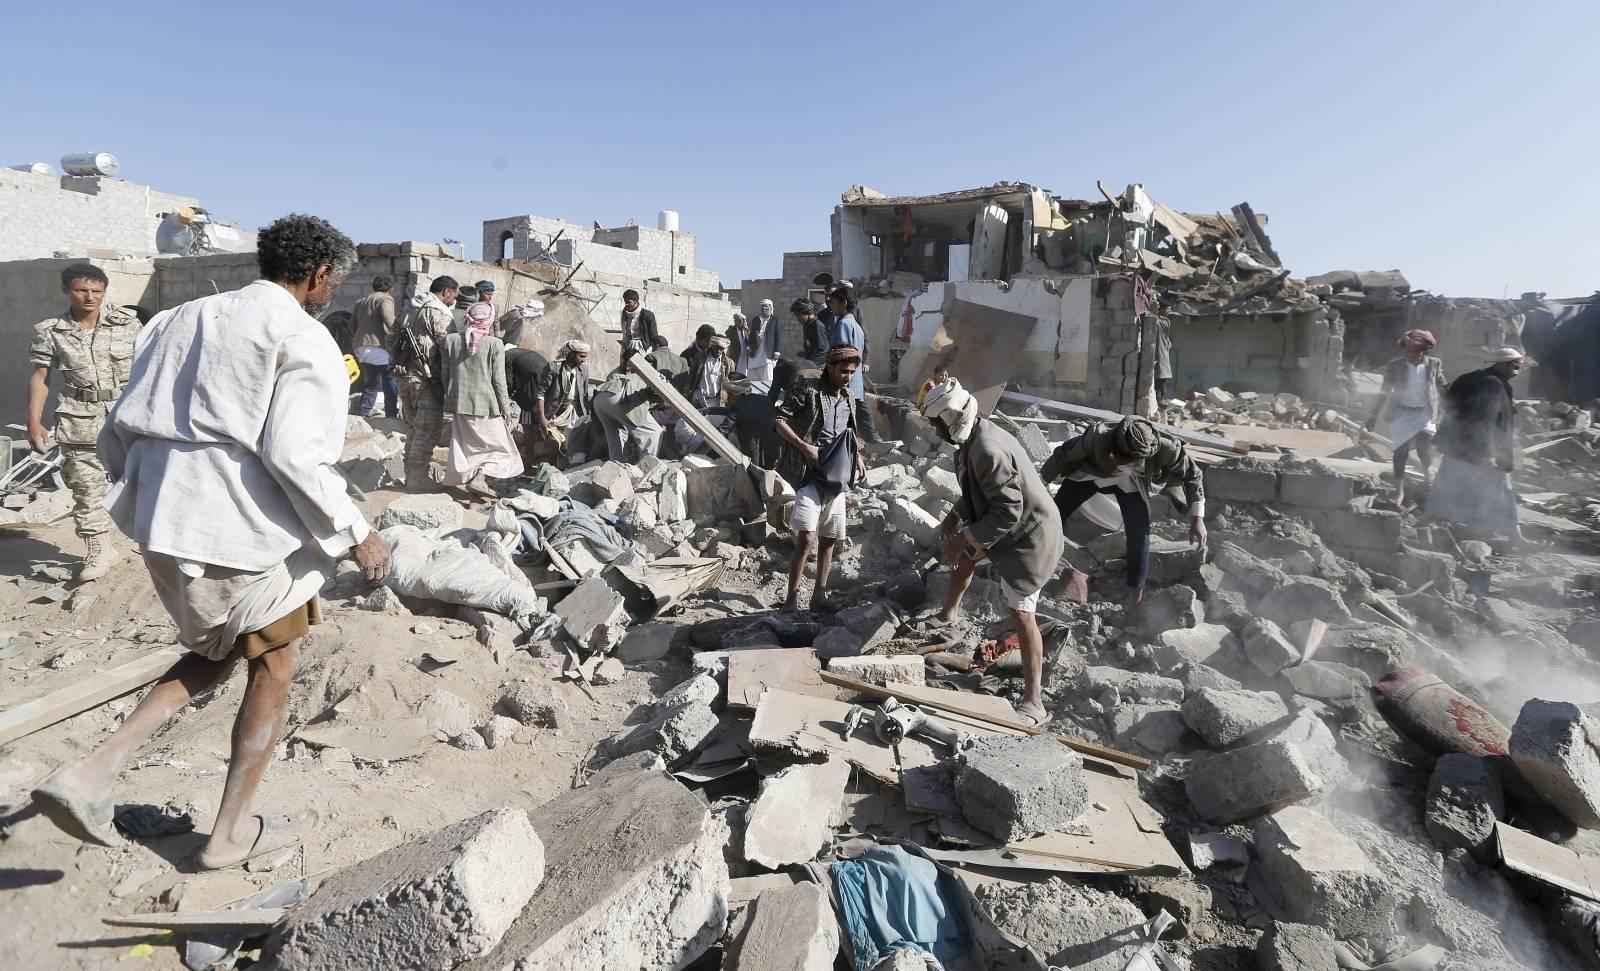 Afermath of a Saudi strike in Yemen